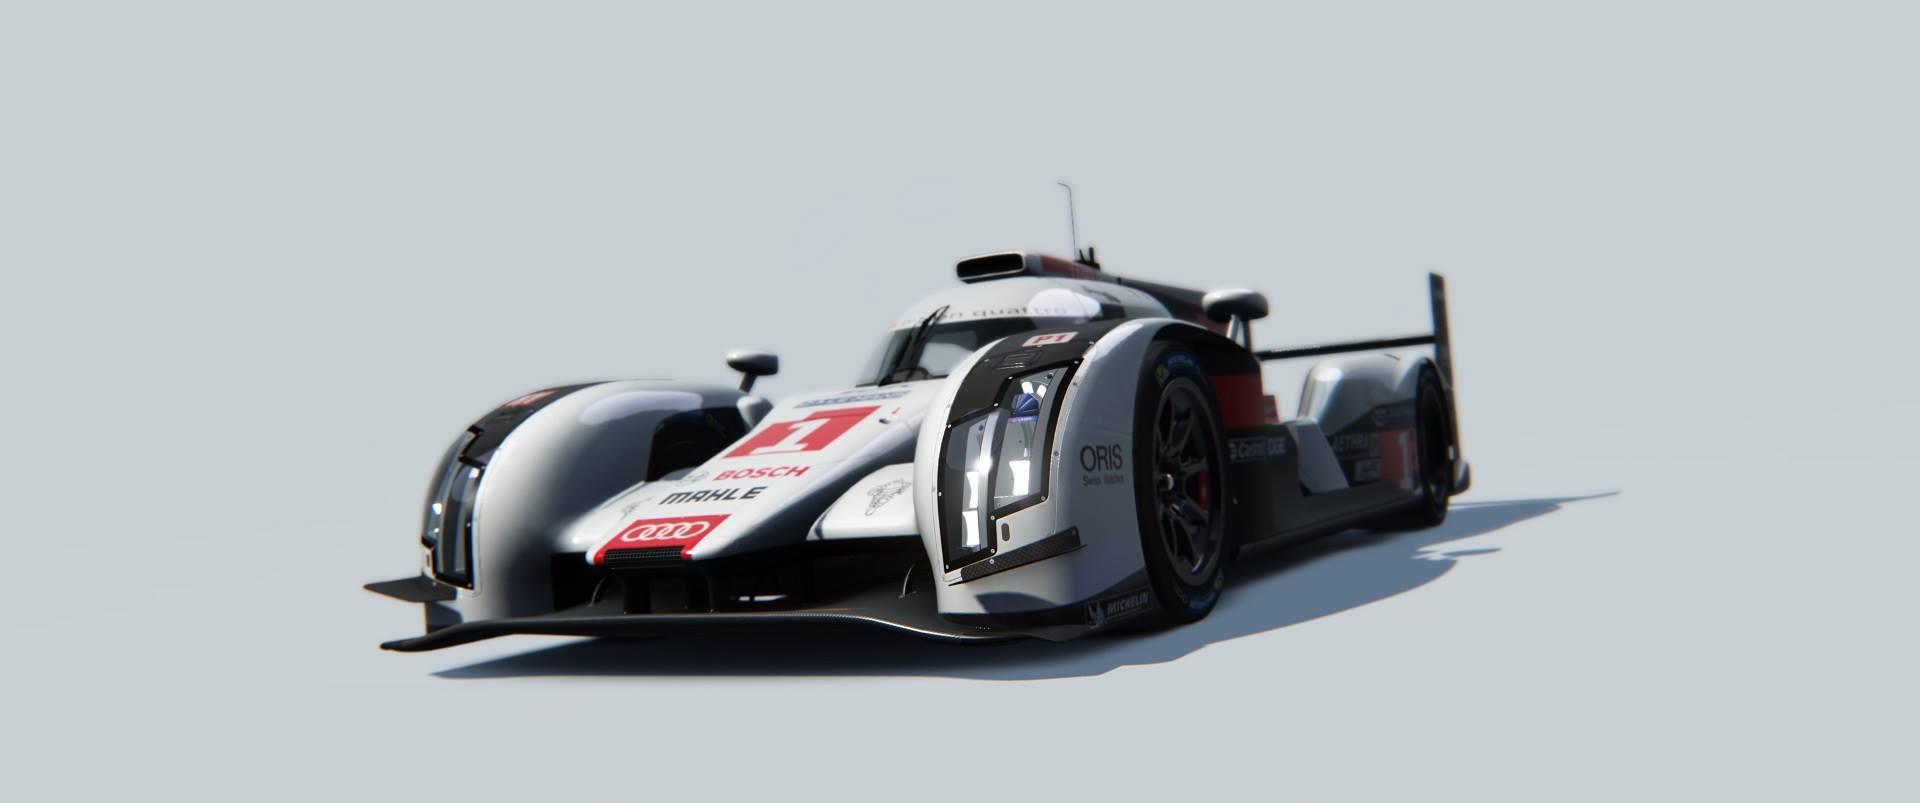 Assetto Corsa Audi LMP1.jpg